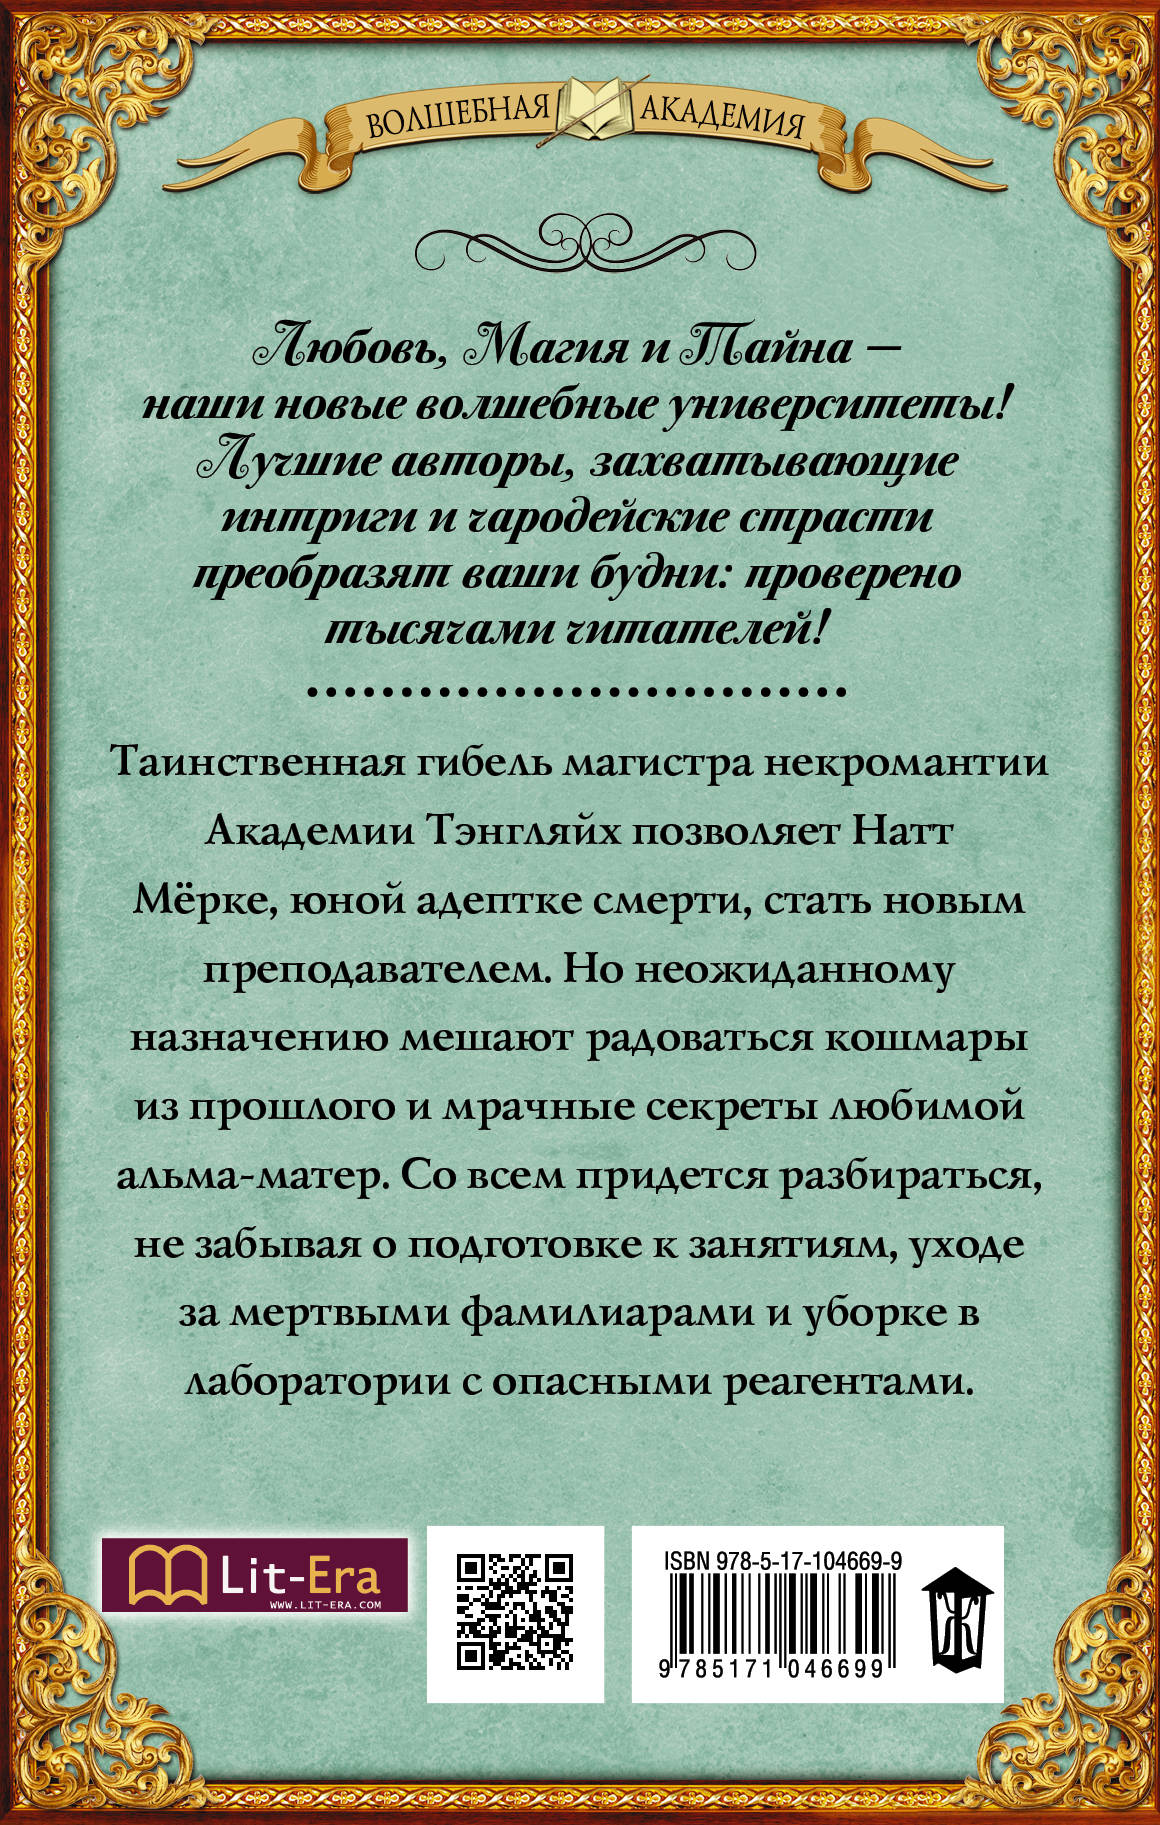 Педагогика для некроманта. Сорокина Дарья Михайловна